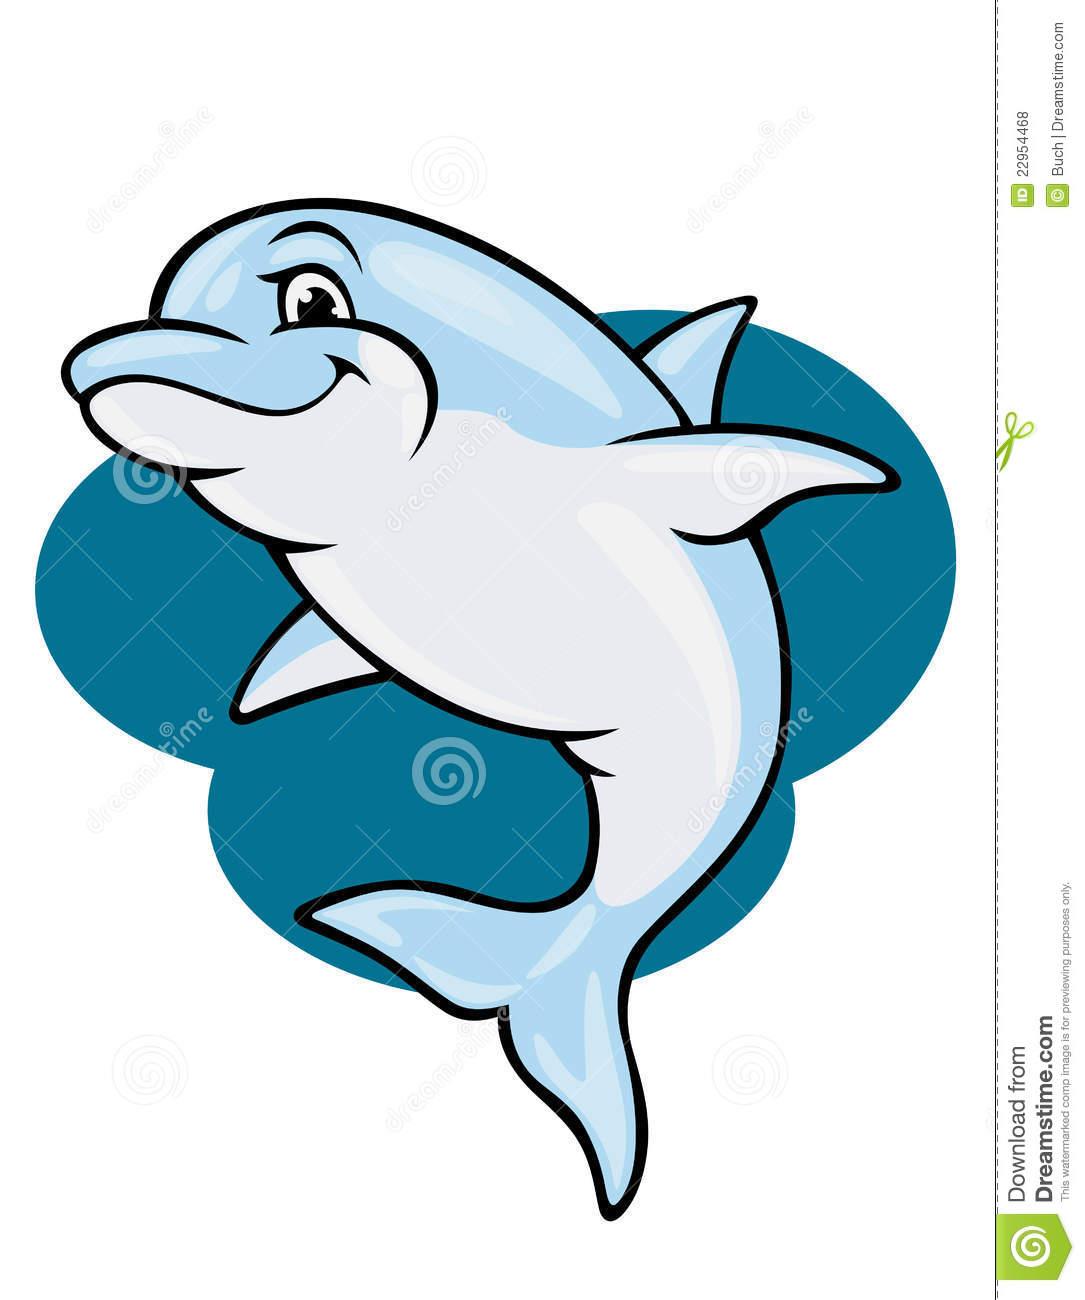 Cartoon Dolphin Clipart - Clipart Suggest